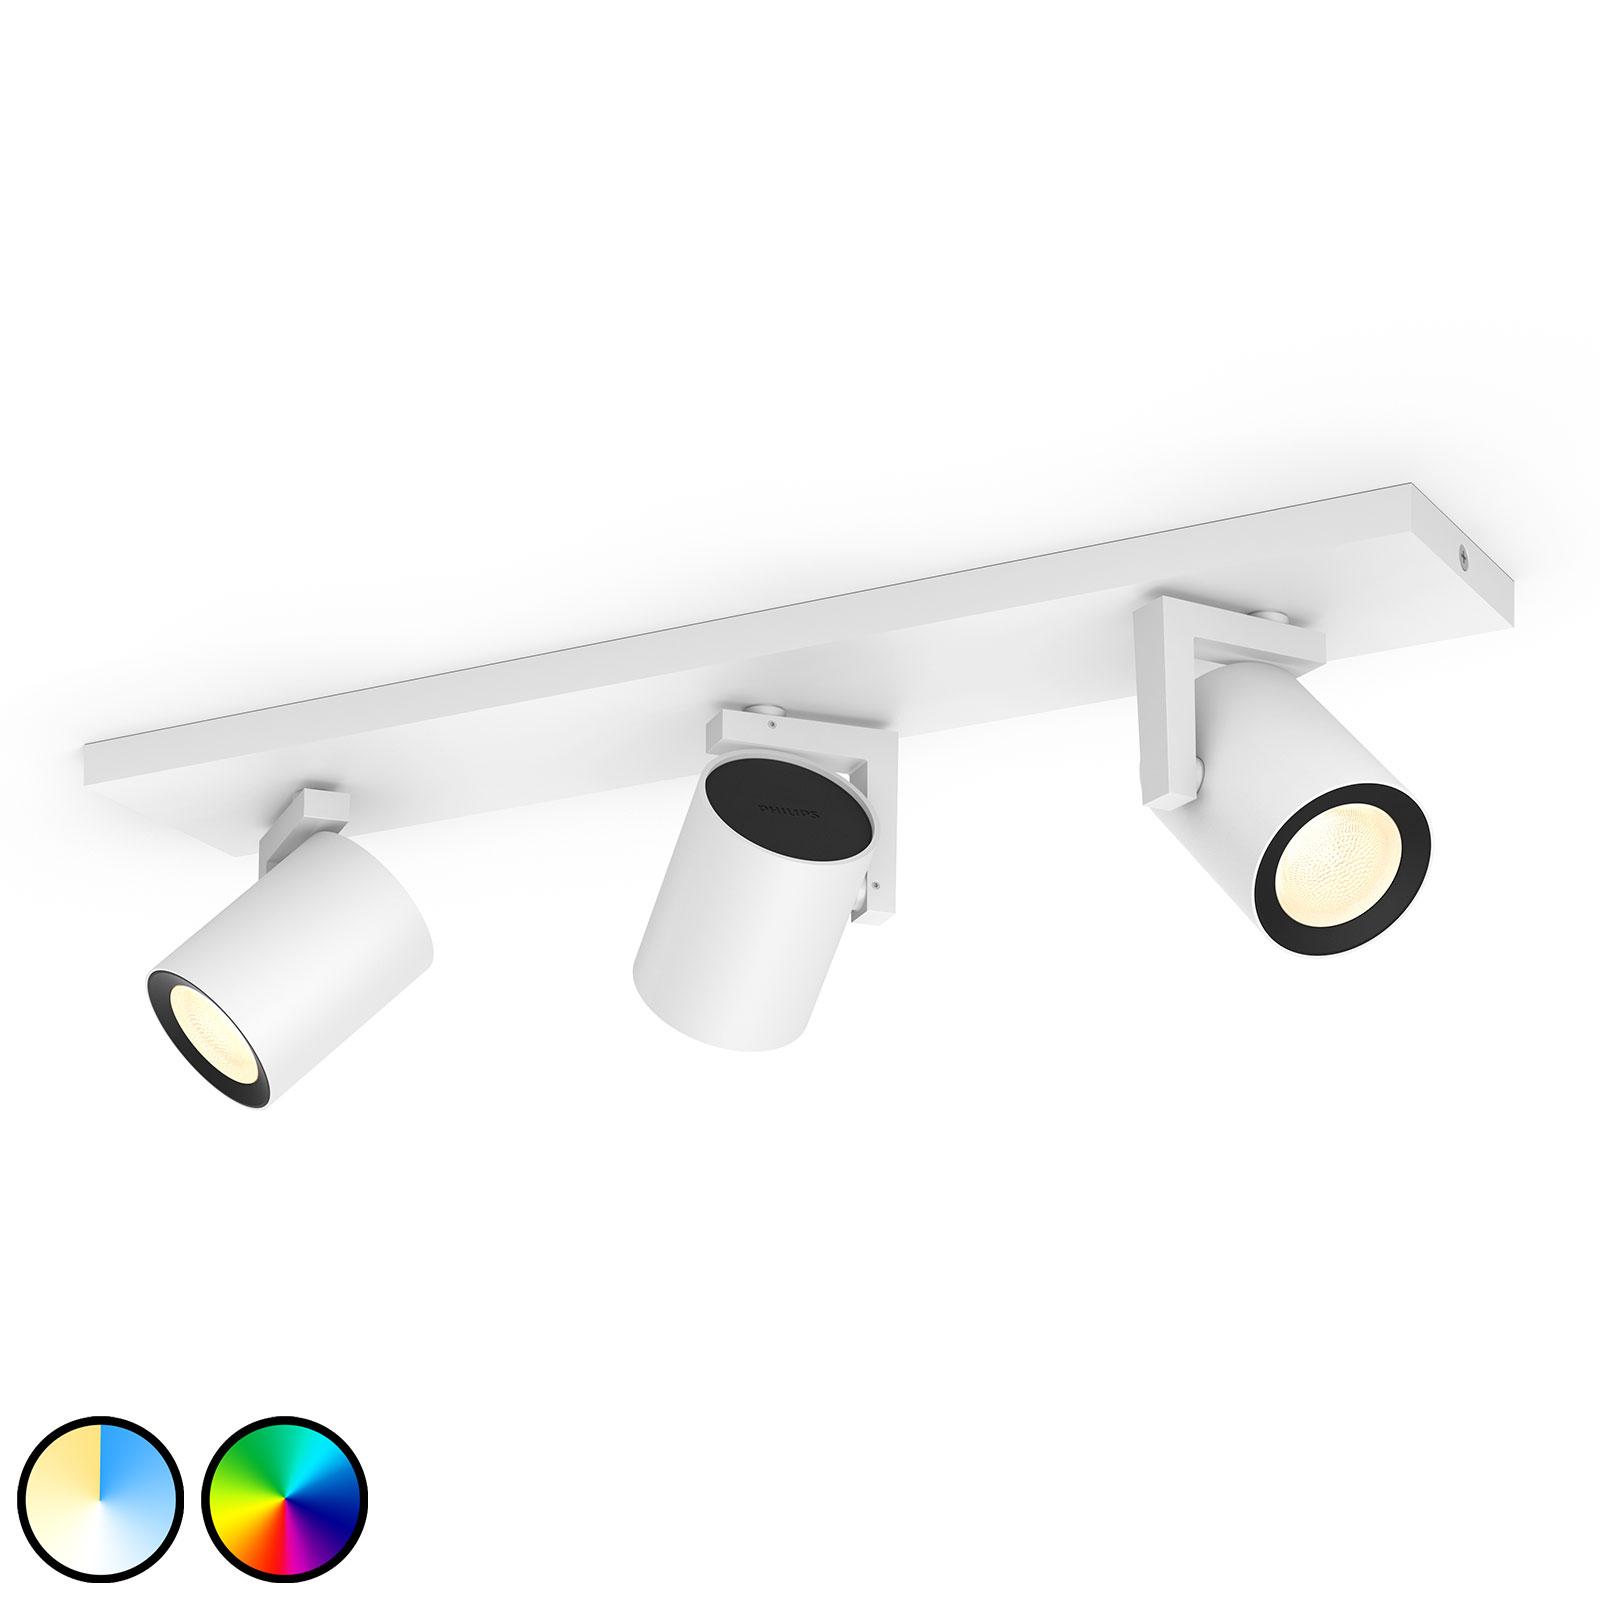 Philips Hue Argenta foco LED, 3 luces, blanco